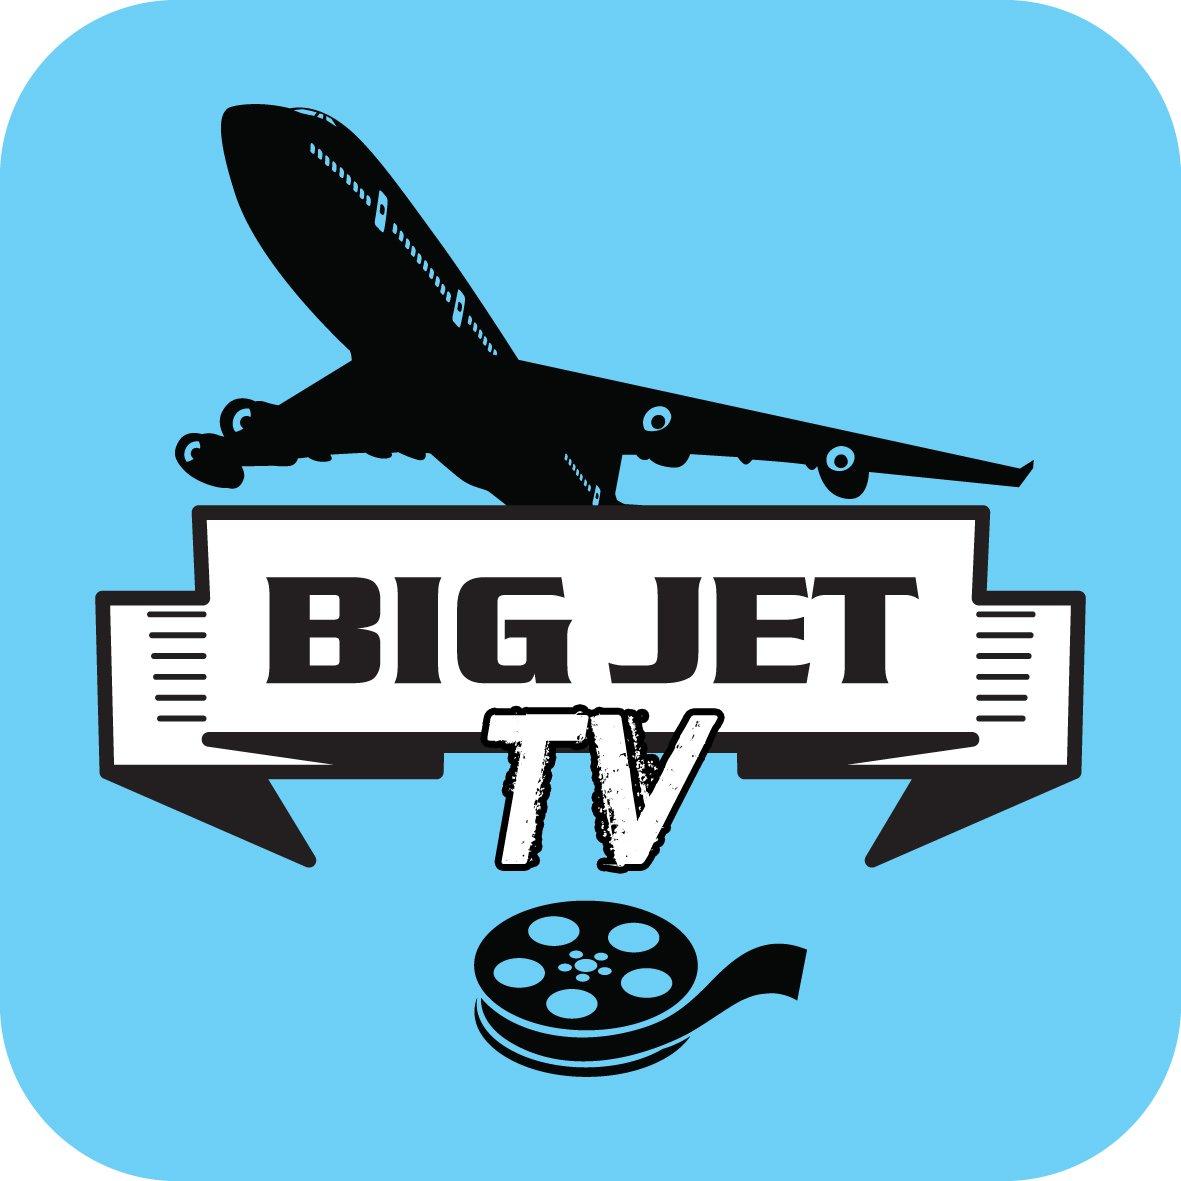 facebook-logo-1181x1181.original.jpg